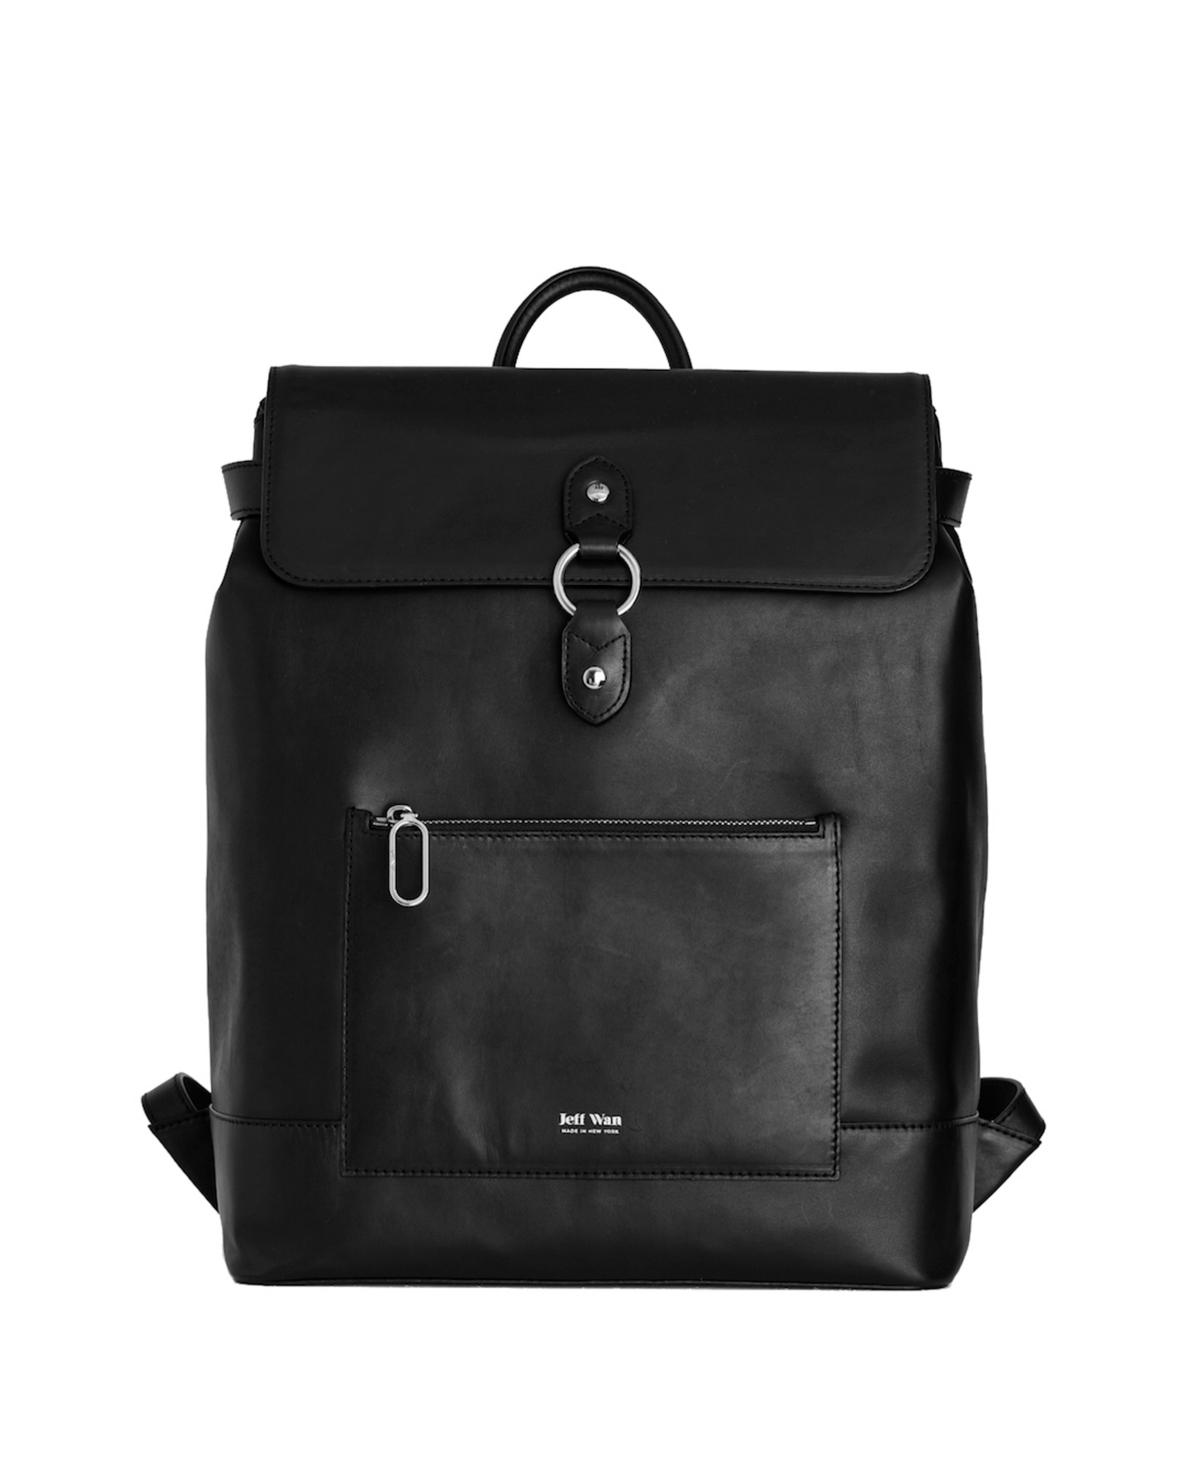 Jeff Wan Le Morne Backpack